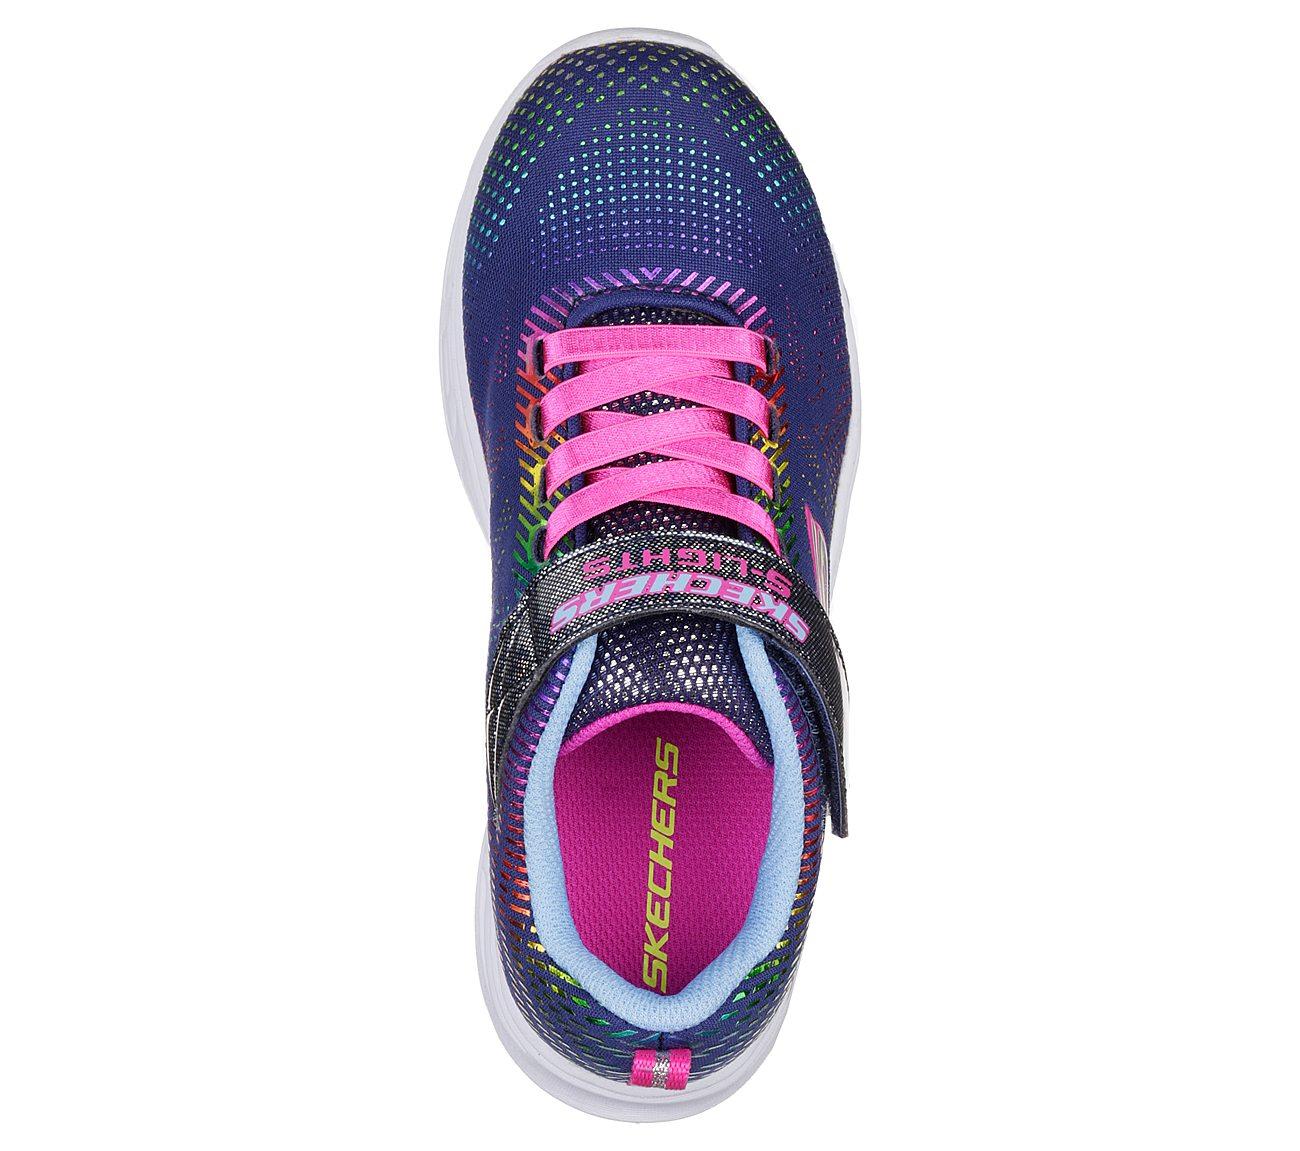 Gleam N' Dream SKECHERS S-Lights Shoes